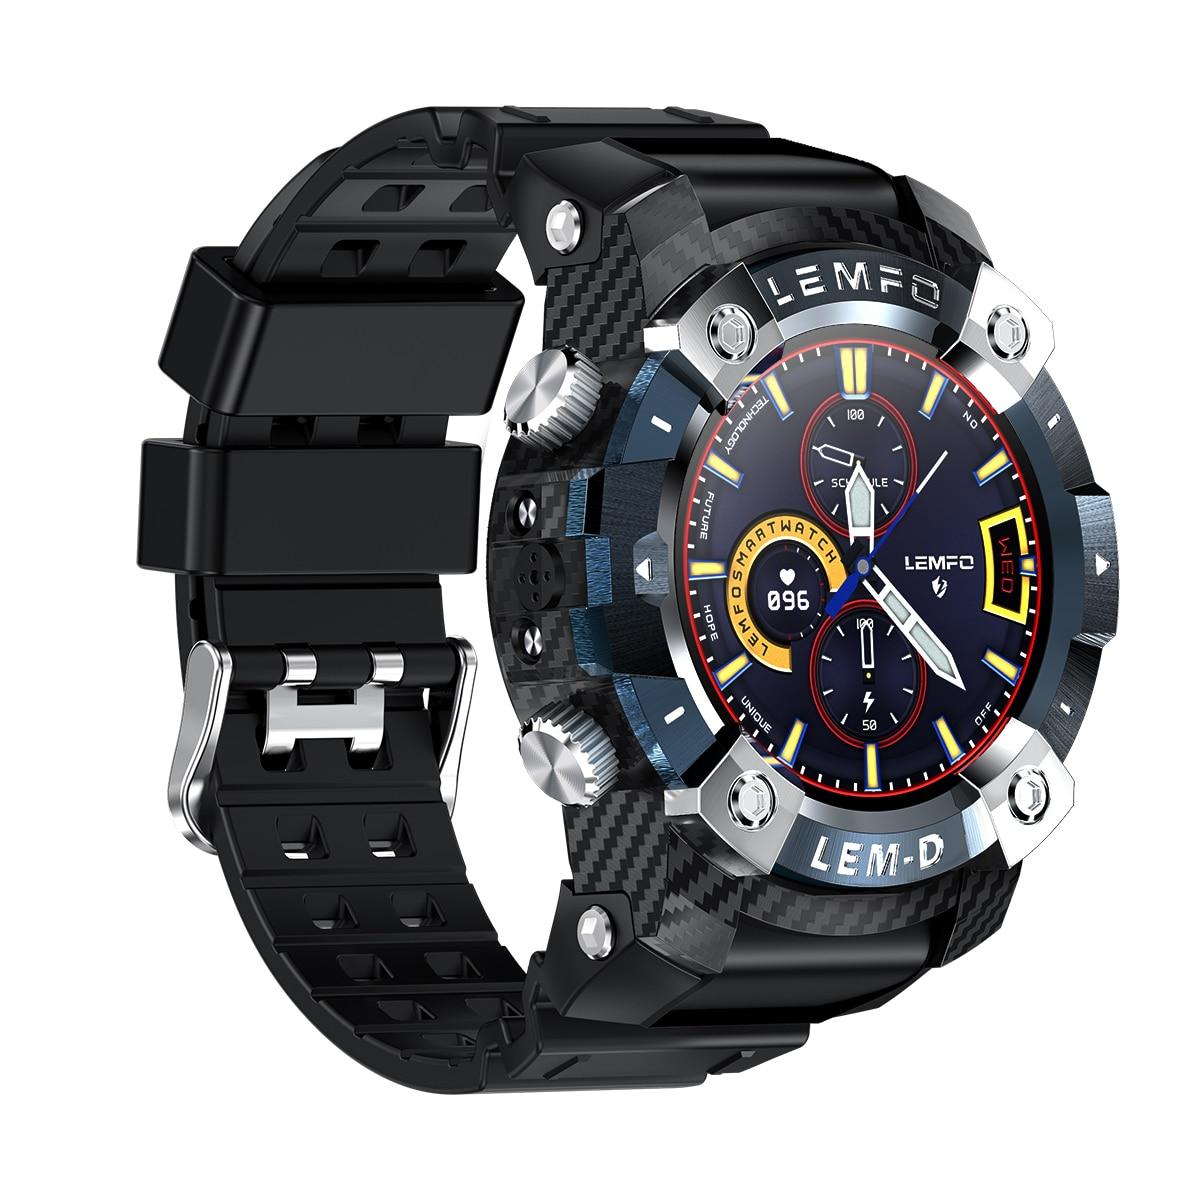 Hf4eb5c76503f4bfabb8970946a0cdd52L LEMFO LEMD Smart Watch Wireless Bluetooth 5.0 Earphone 2 In 1